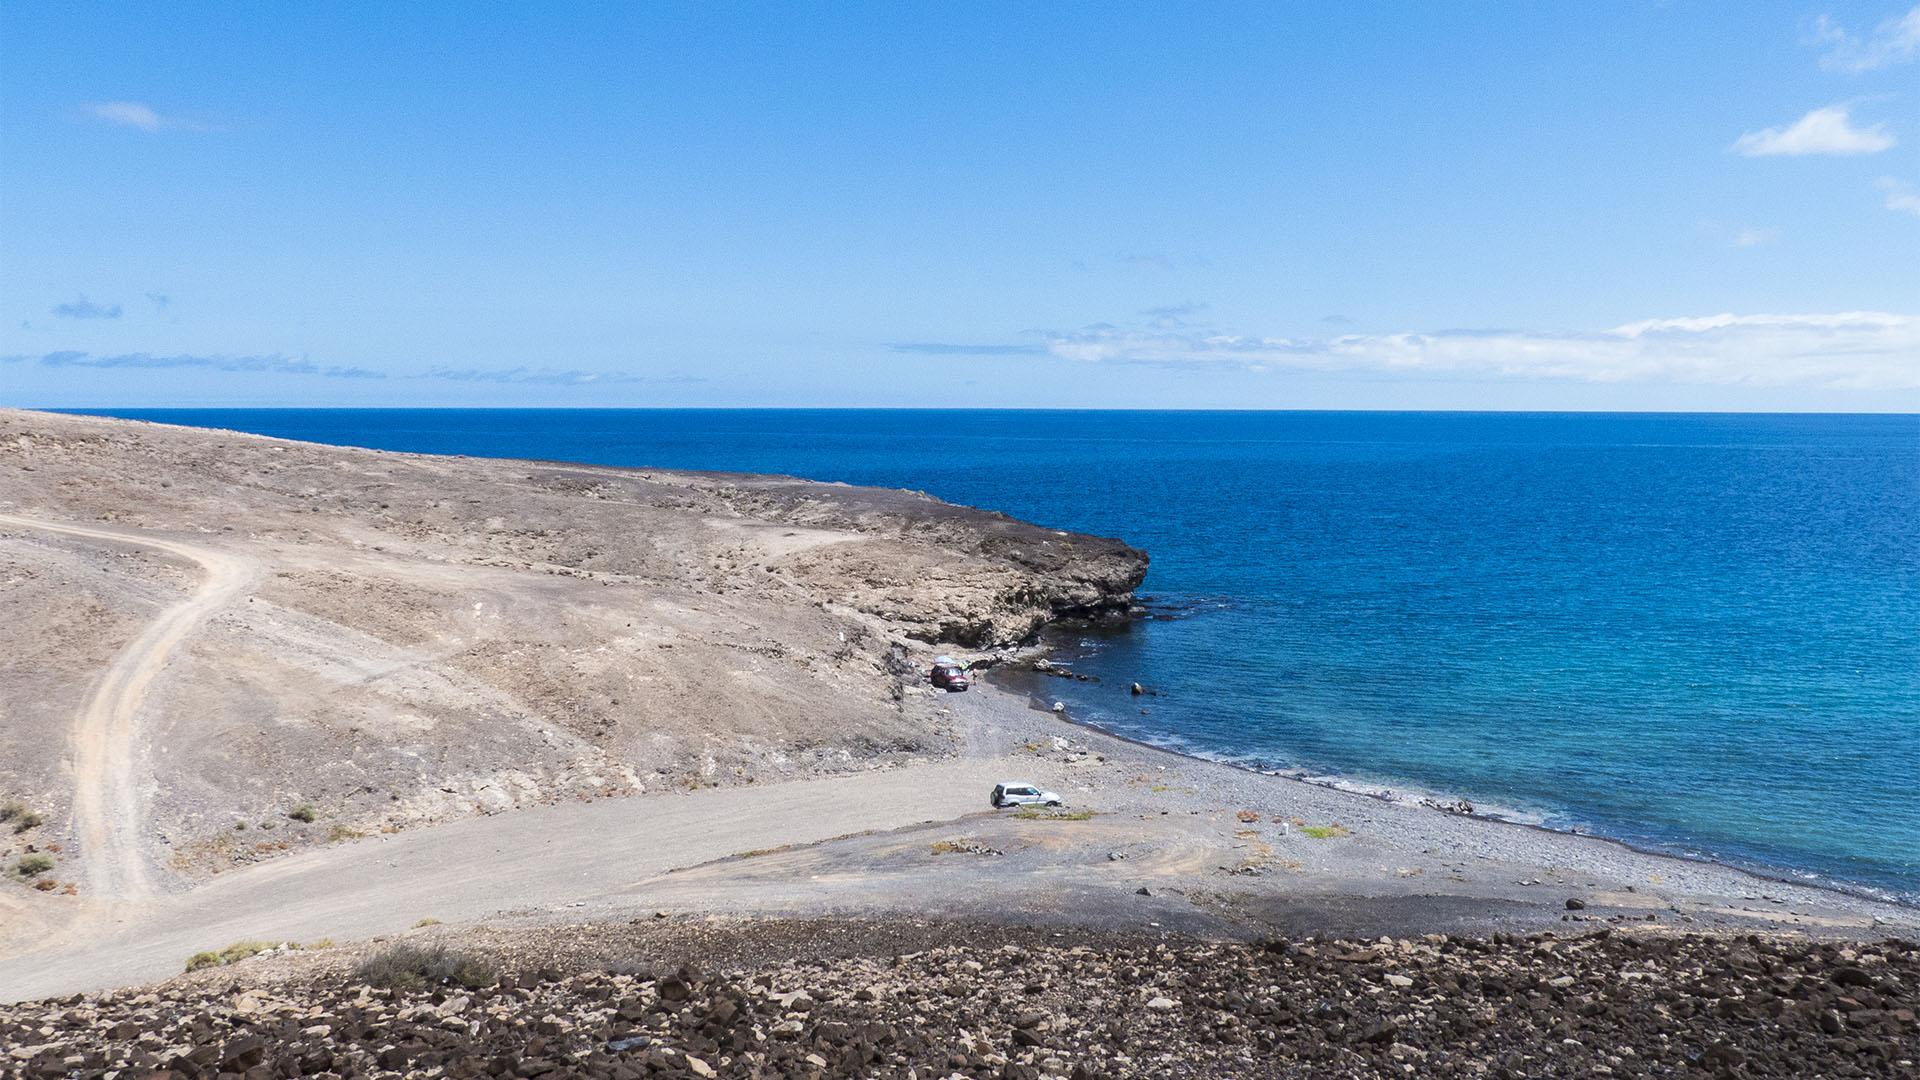 Die Strände Fuerteventuras: La Lajita, Playa da Puerto Rico.